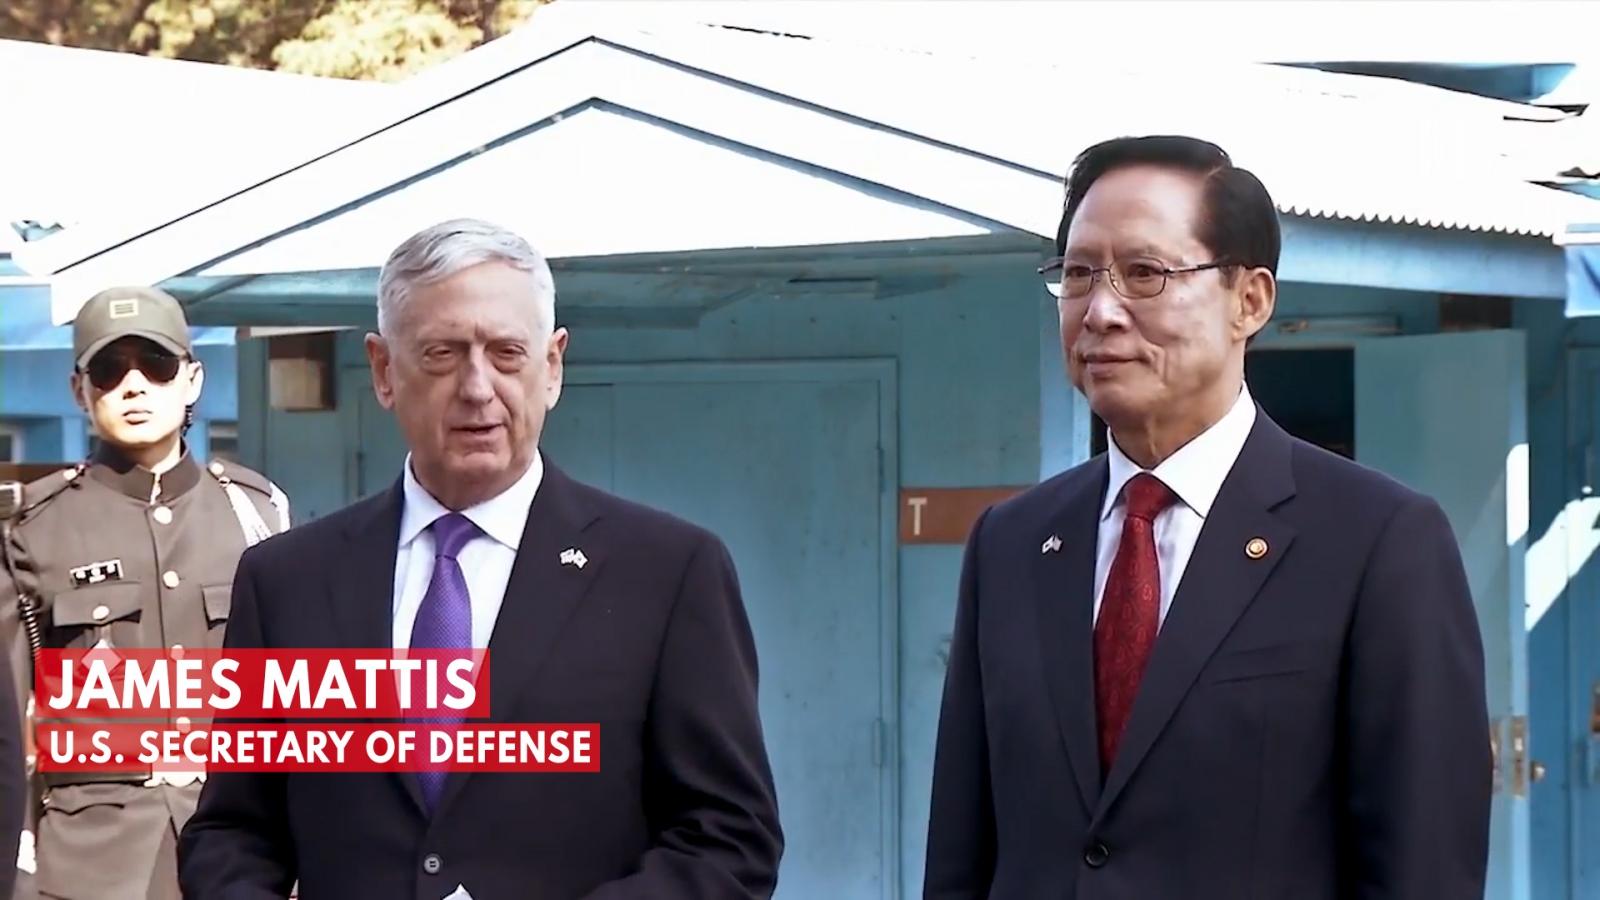 defense-secretary-mattis-at-korean-dmz-our-goal-is-not-war